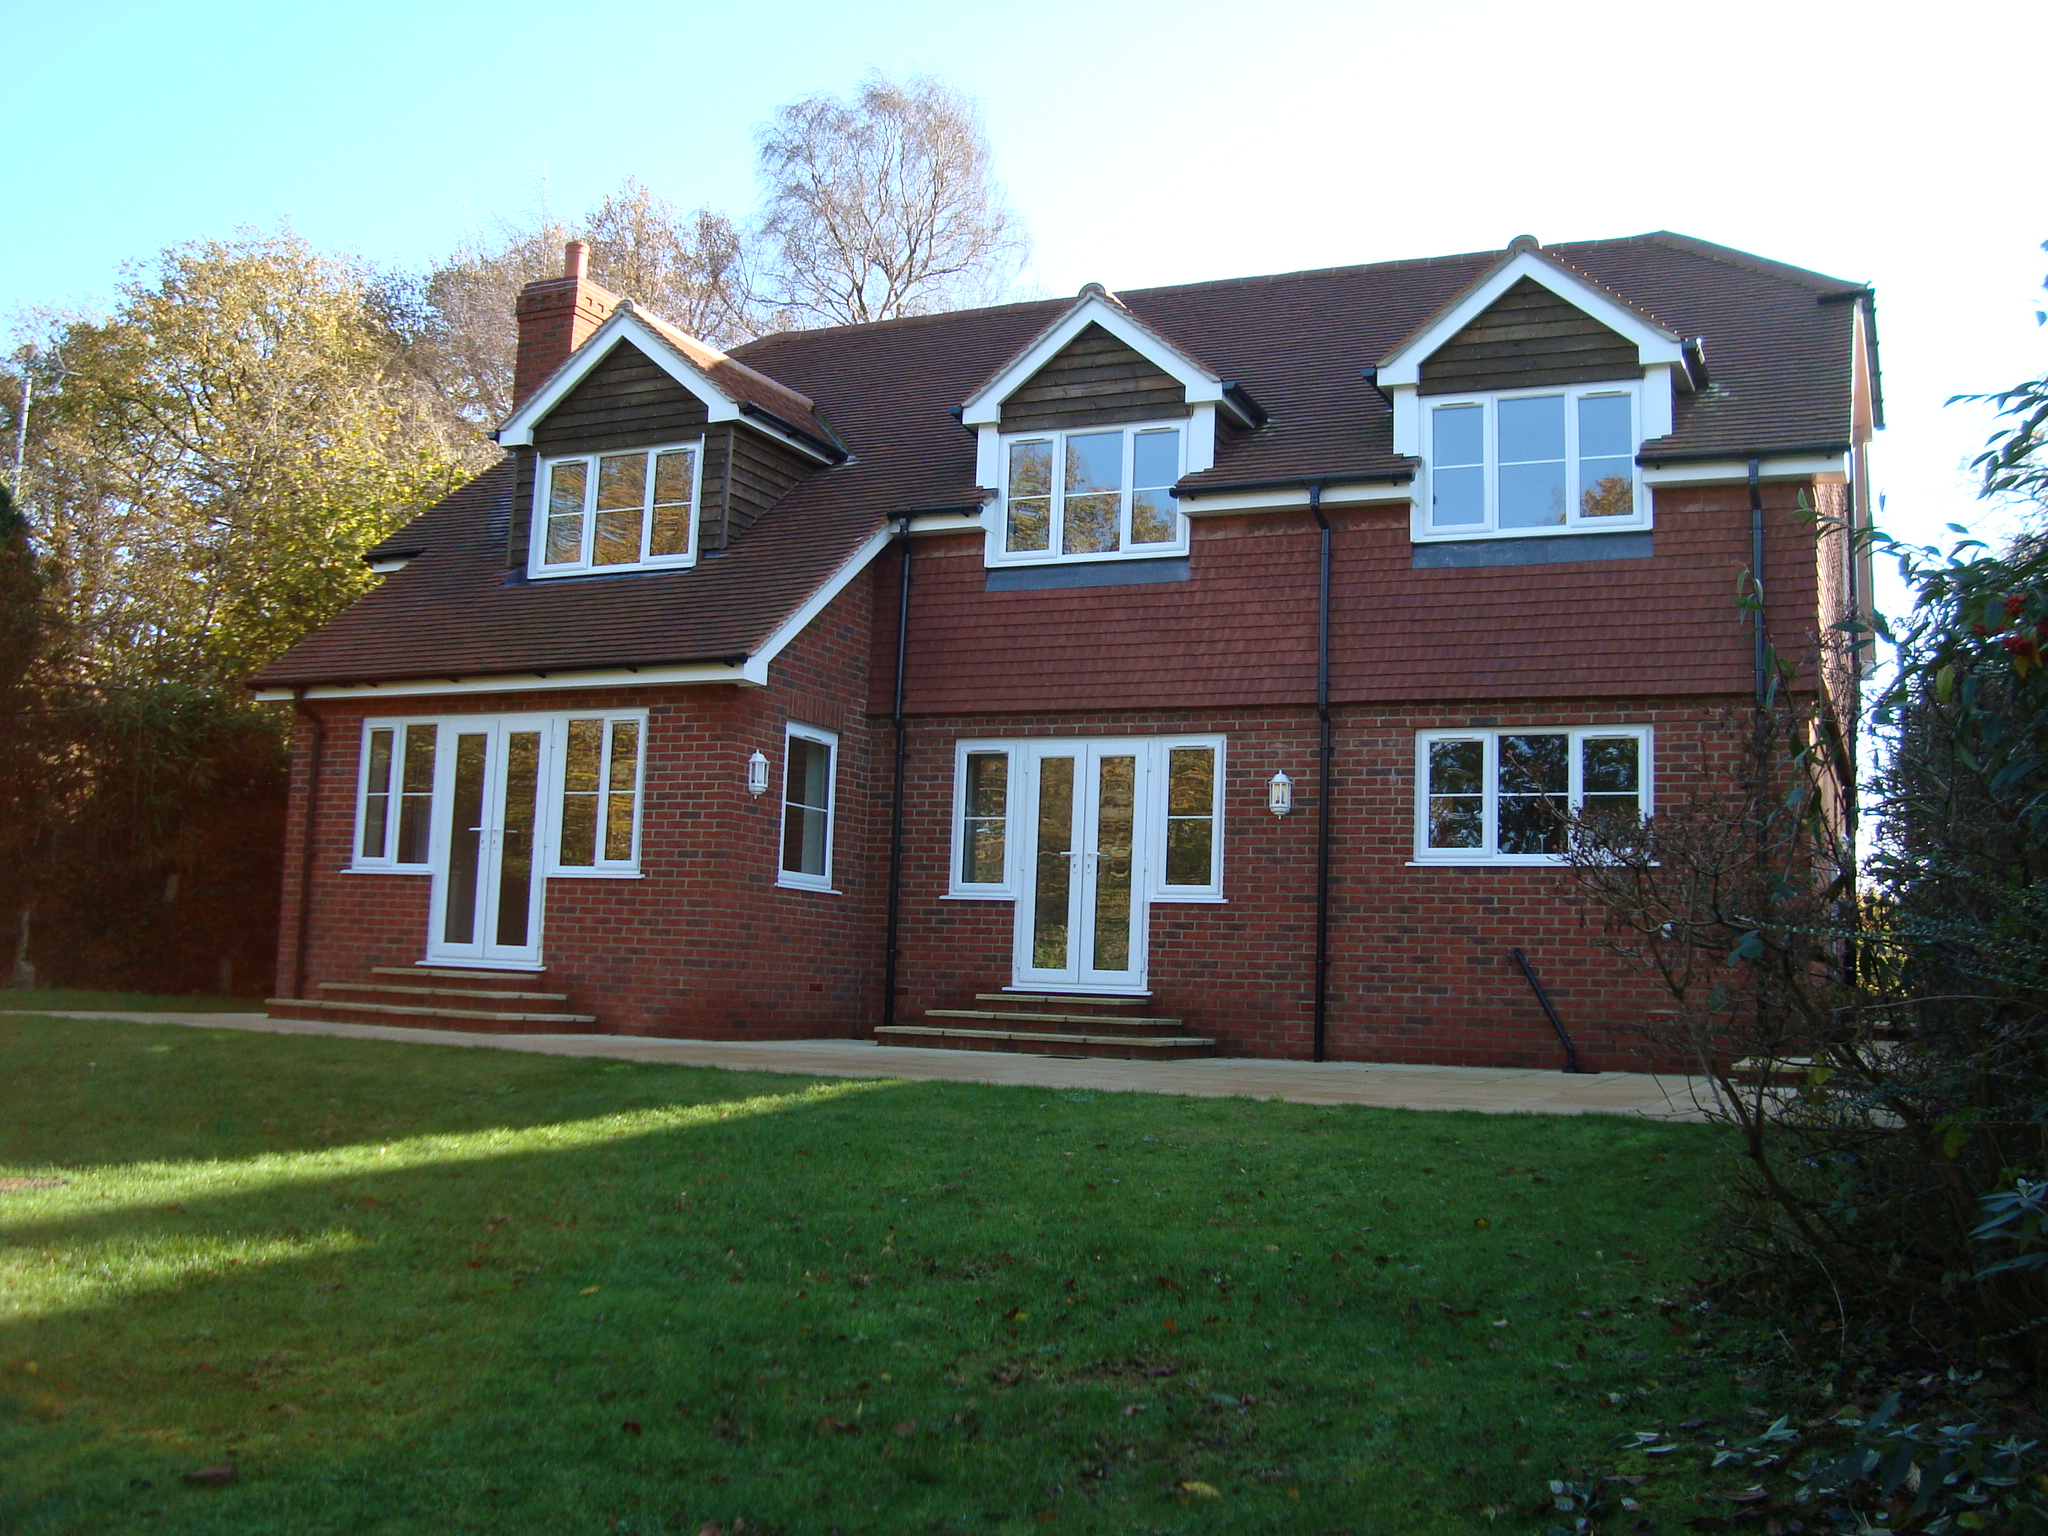 New home developments